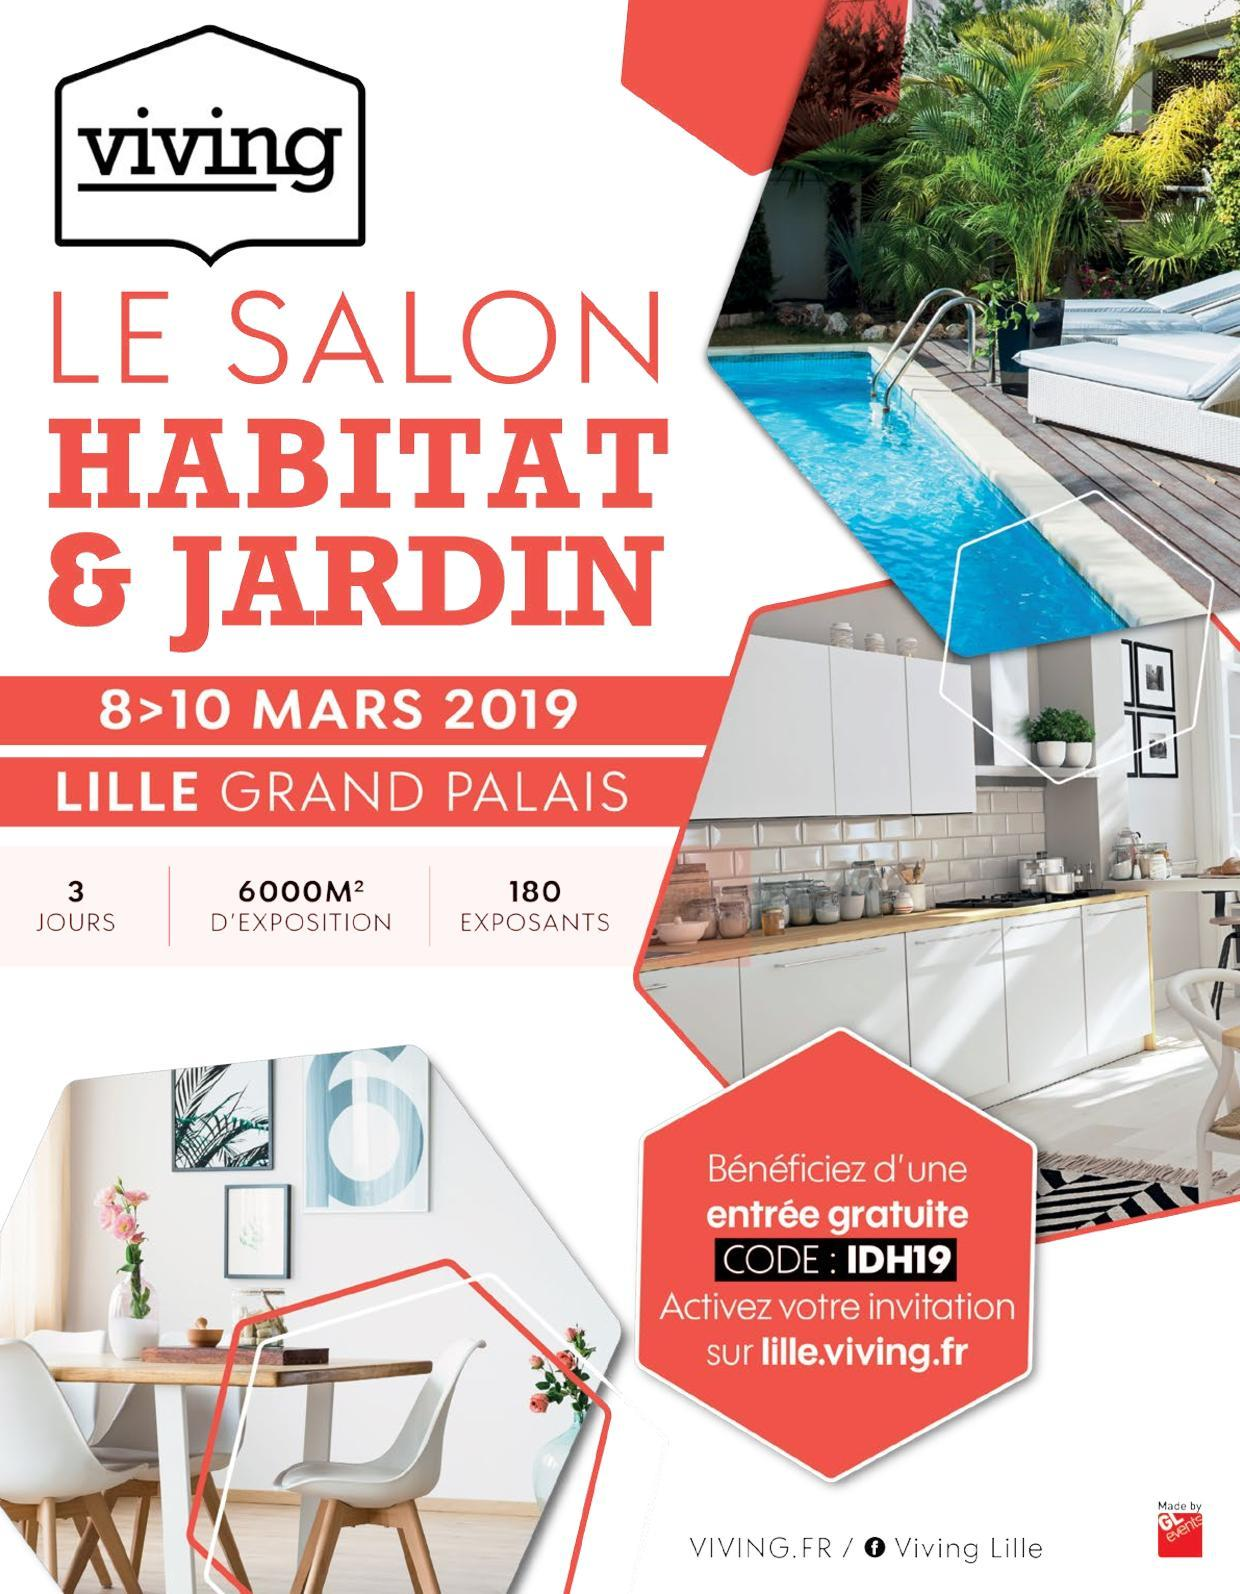 Viving 2019 Lille Grand Palais